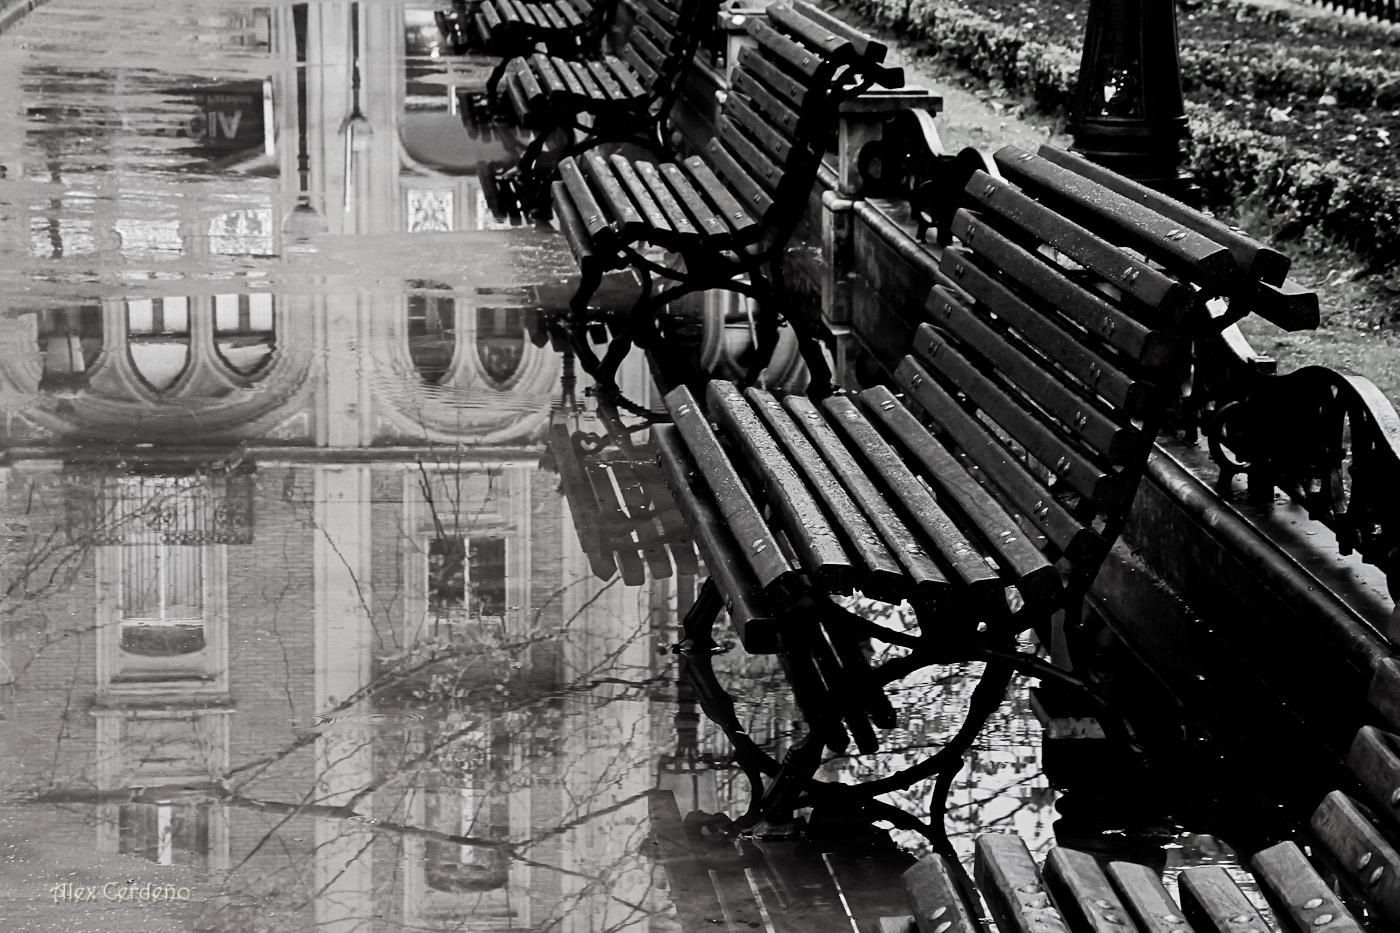 Bancos en la lluvia